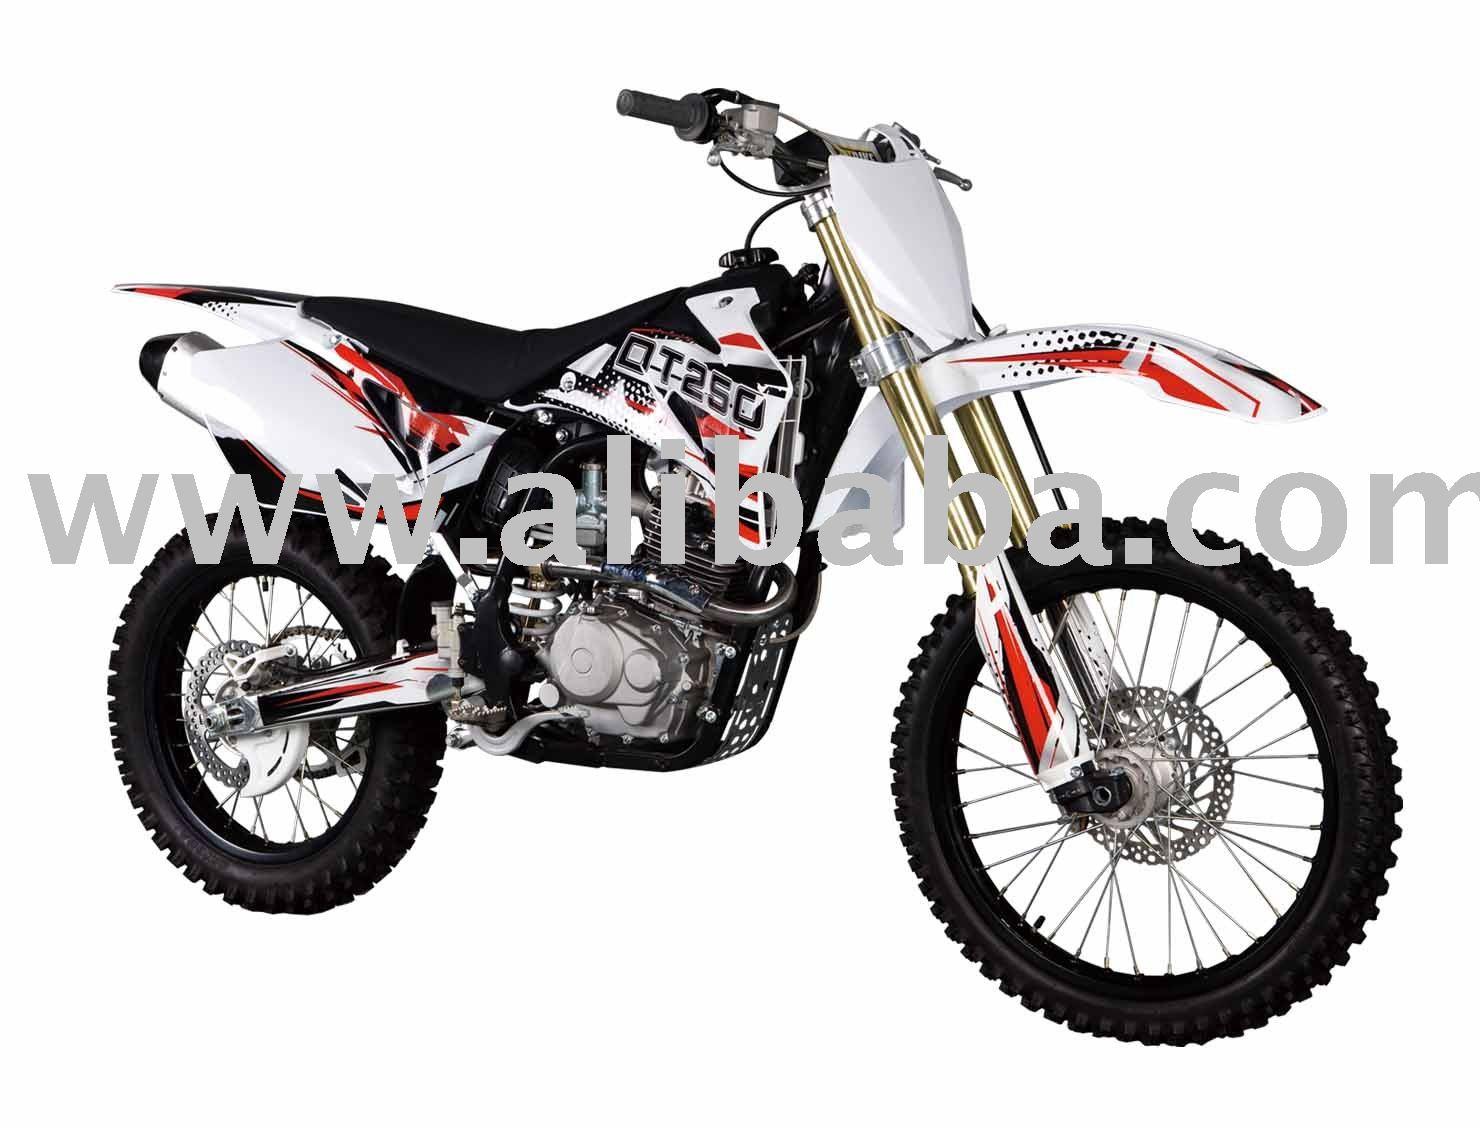 dt250 250cc dirt bike buy dirt bike 250cc motocross product on. Black Bedroom Furniture Sets. Home Design Ideas